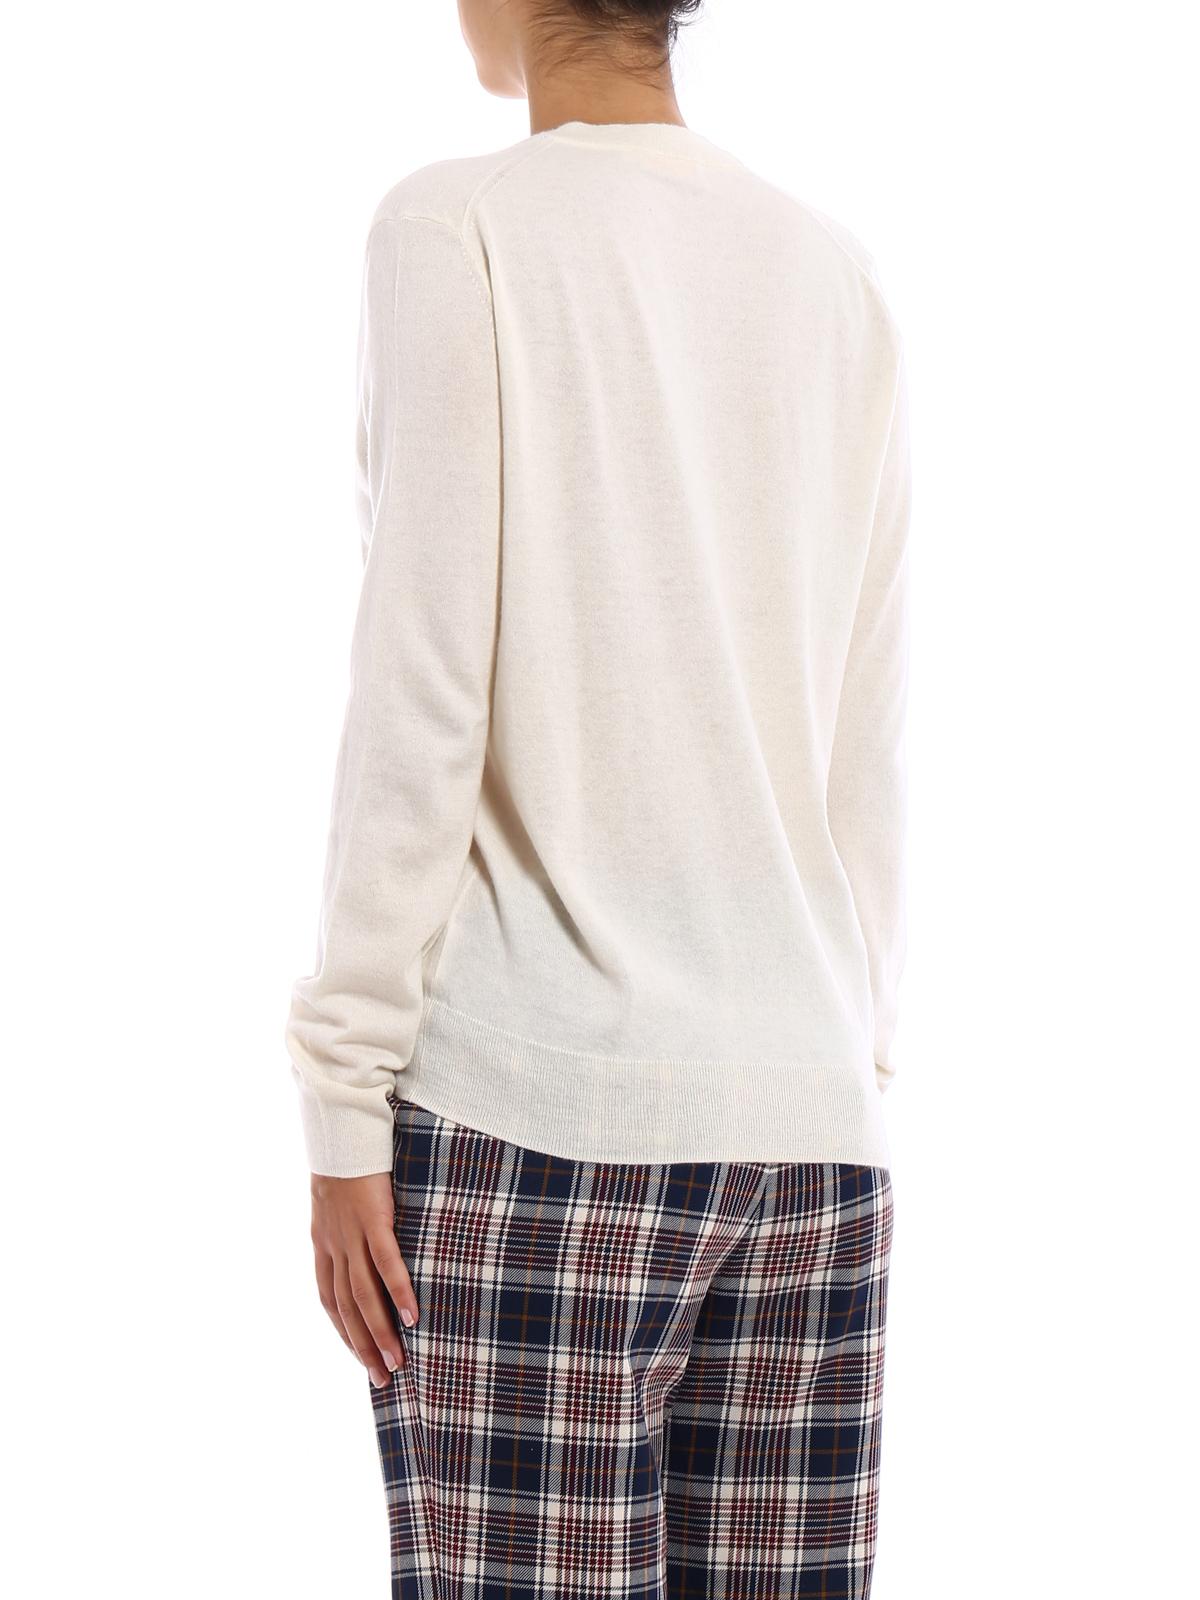 a23de4b2bed Tory Burch - Marilyn ivory cashmere sweater - v necks - 40724104